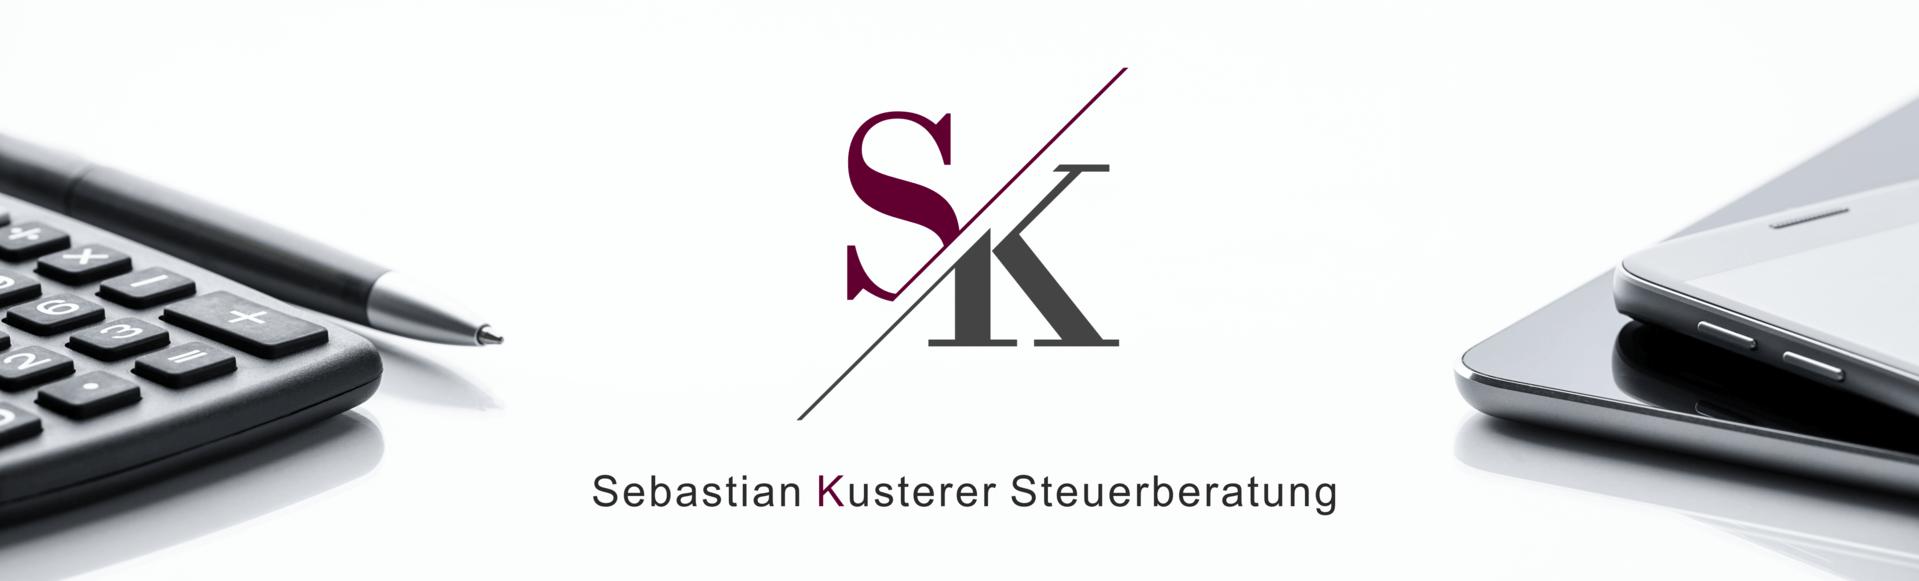 Sebastian Kusterer – Steuerberatung – Karlsruhe